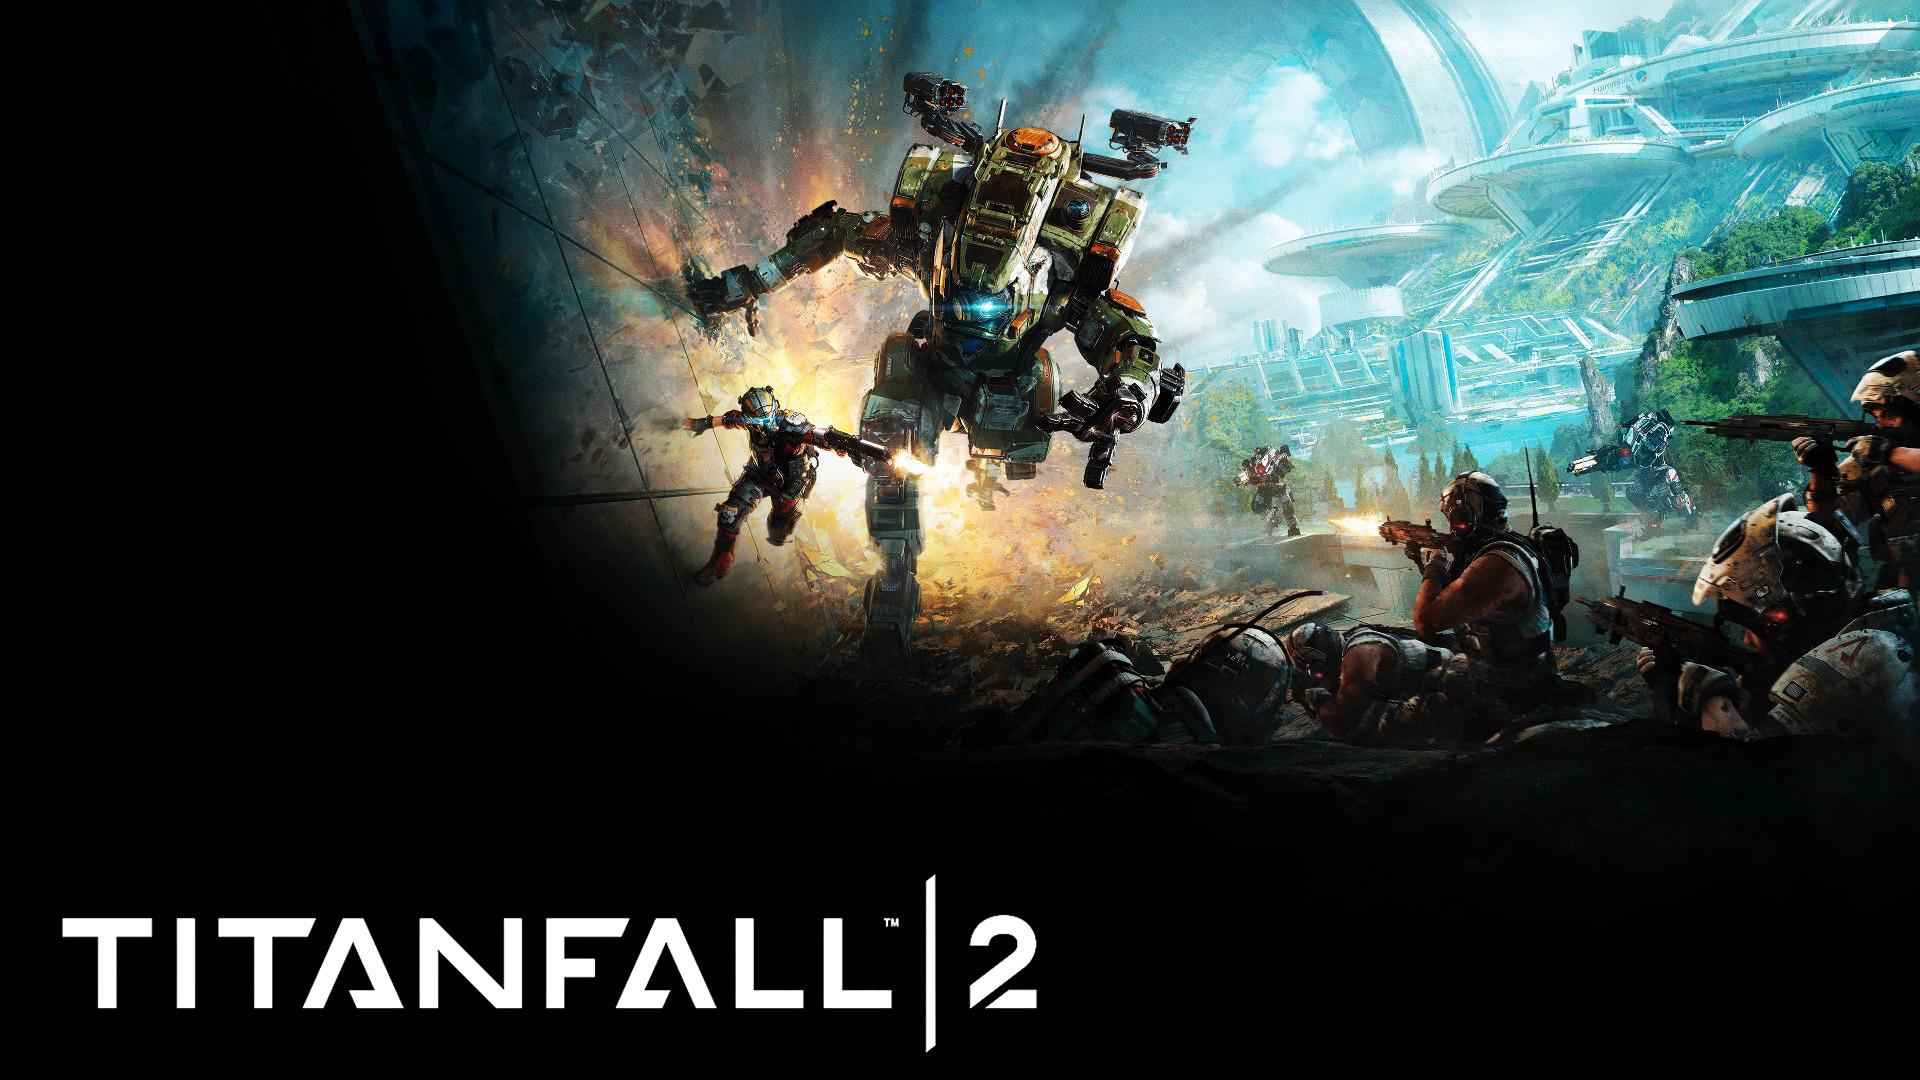 1080p Fall Wallpaper Titanfall 2 Wallpapers 183 ①